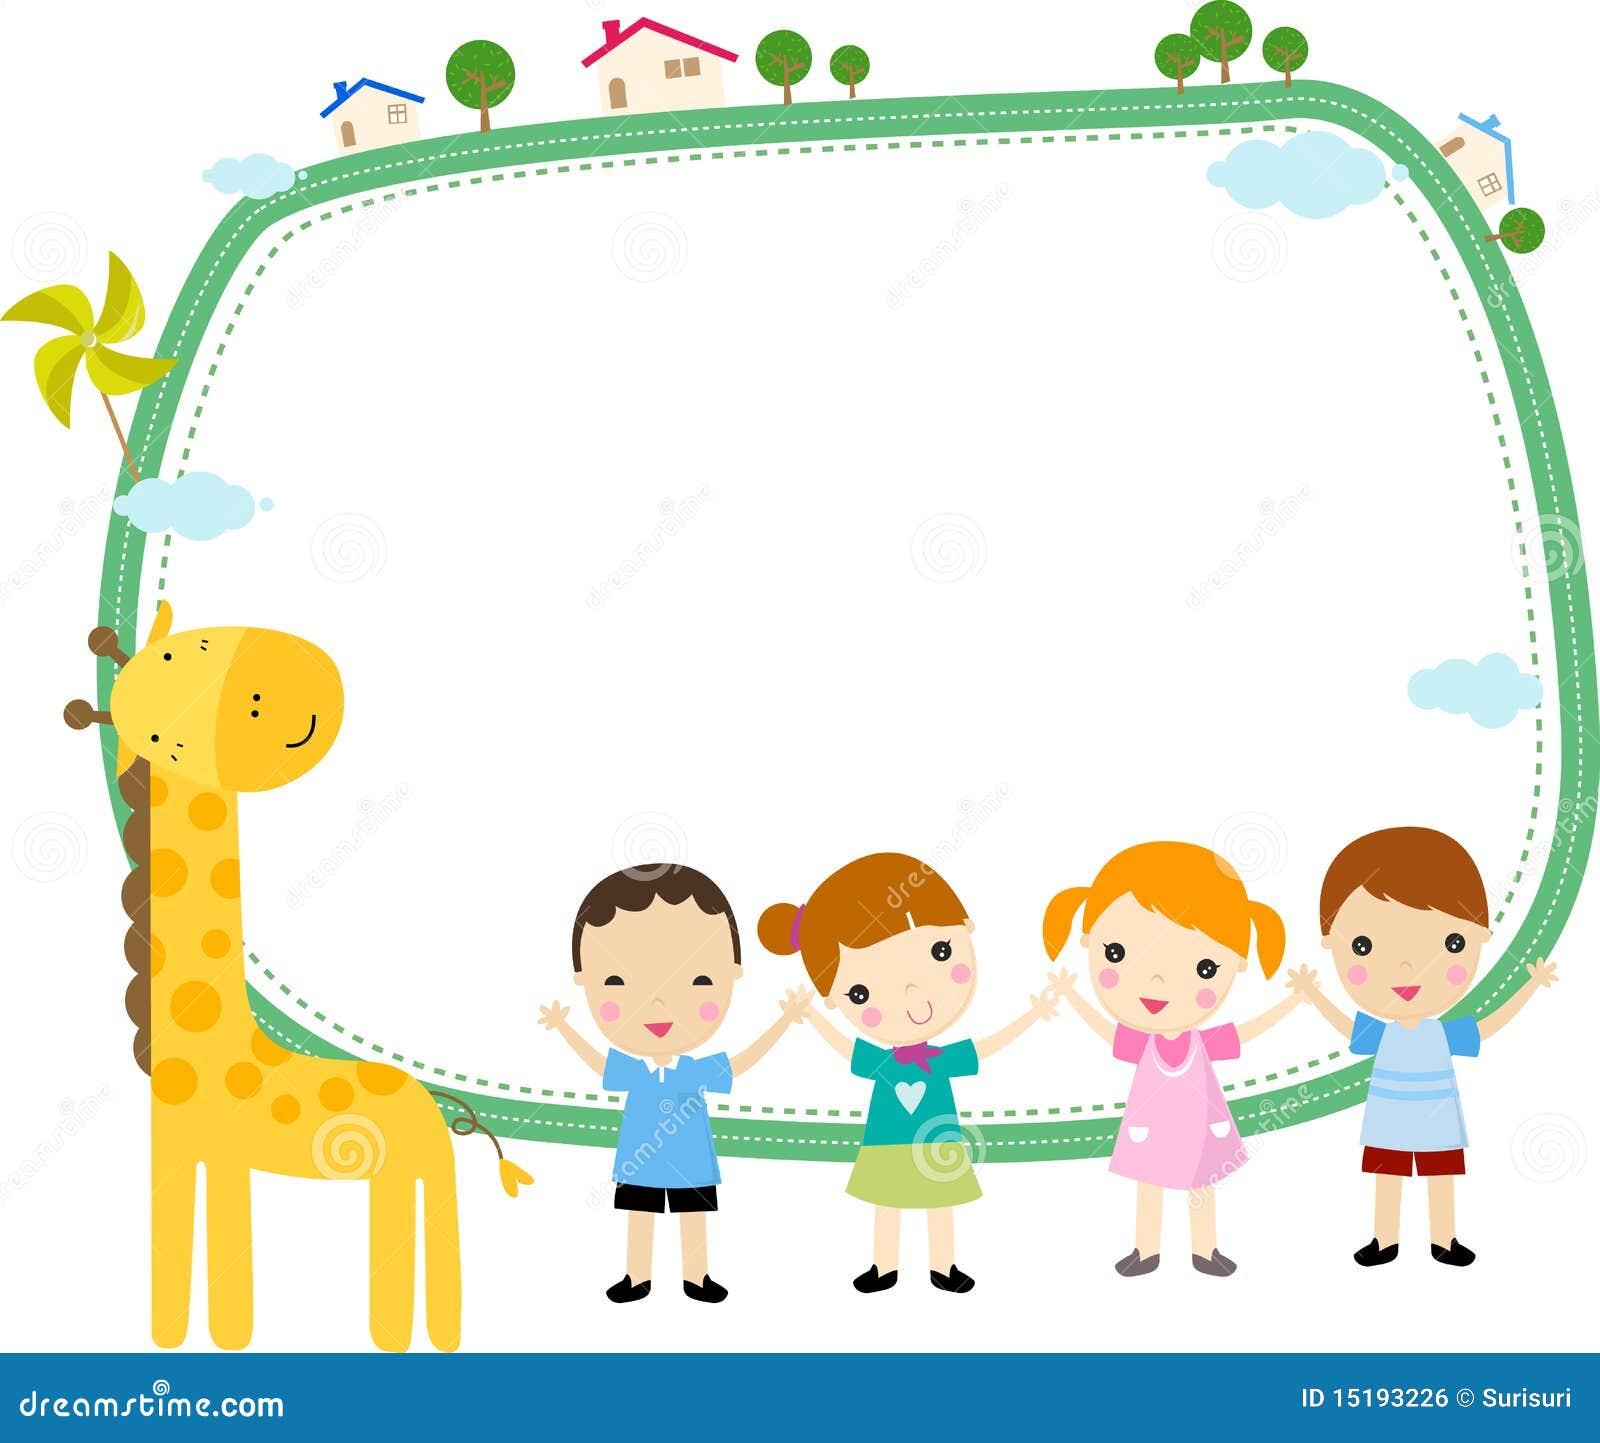 Royalty Free Stock Image Kids Frame Image15193226 on Shapes Art For Preschool